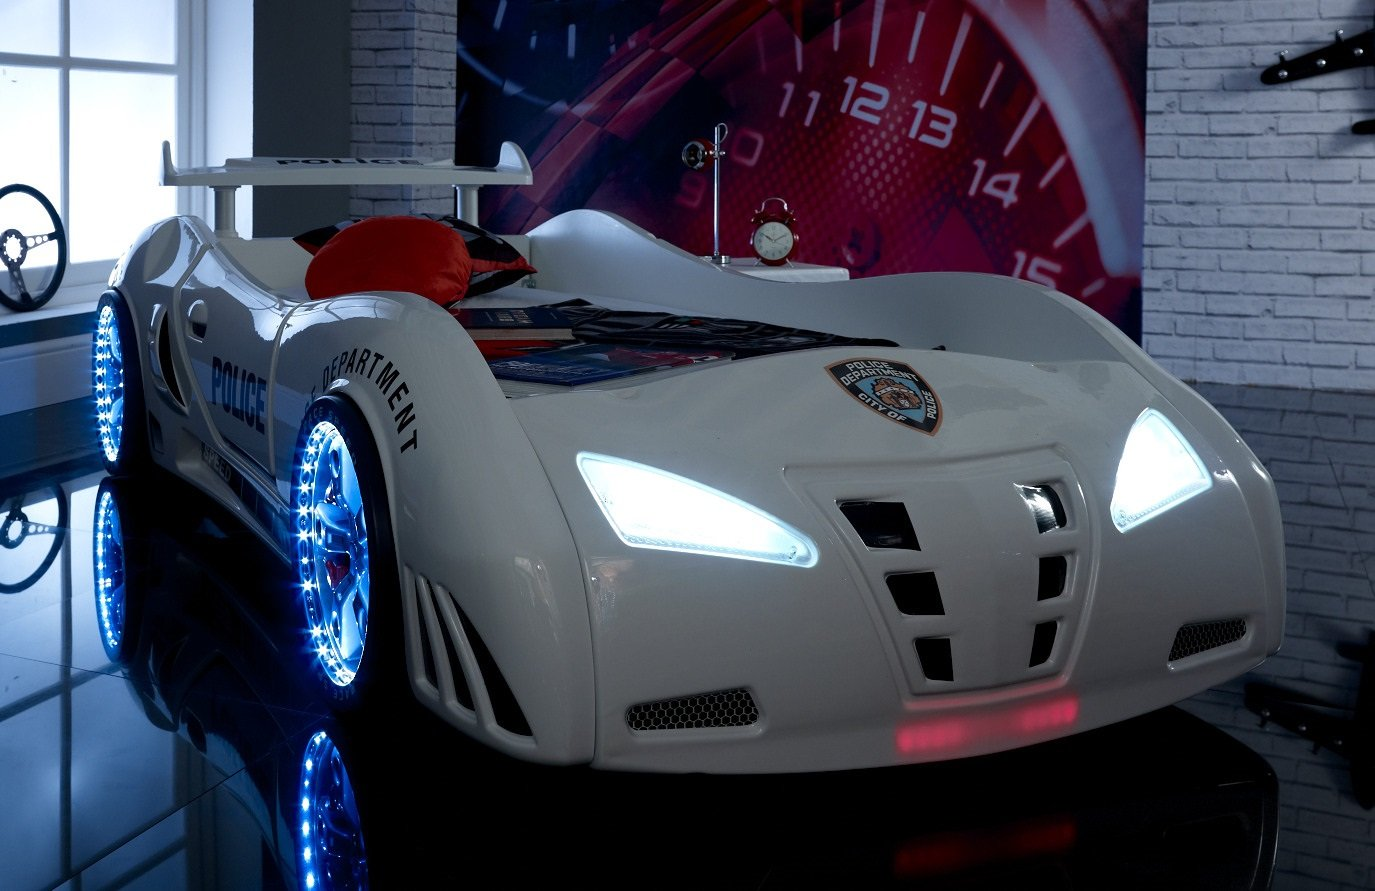 CAR BED POLICE - LED LIGHTS + SOUND - White - Childrens car bed